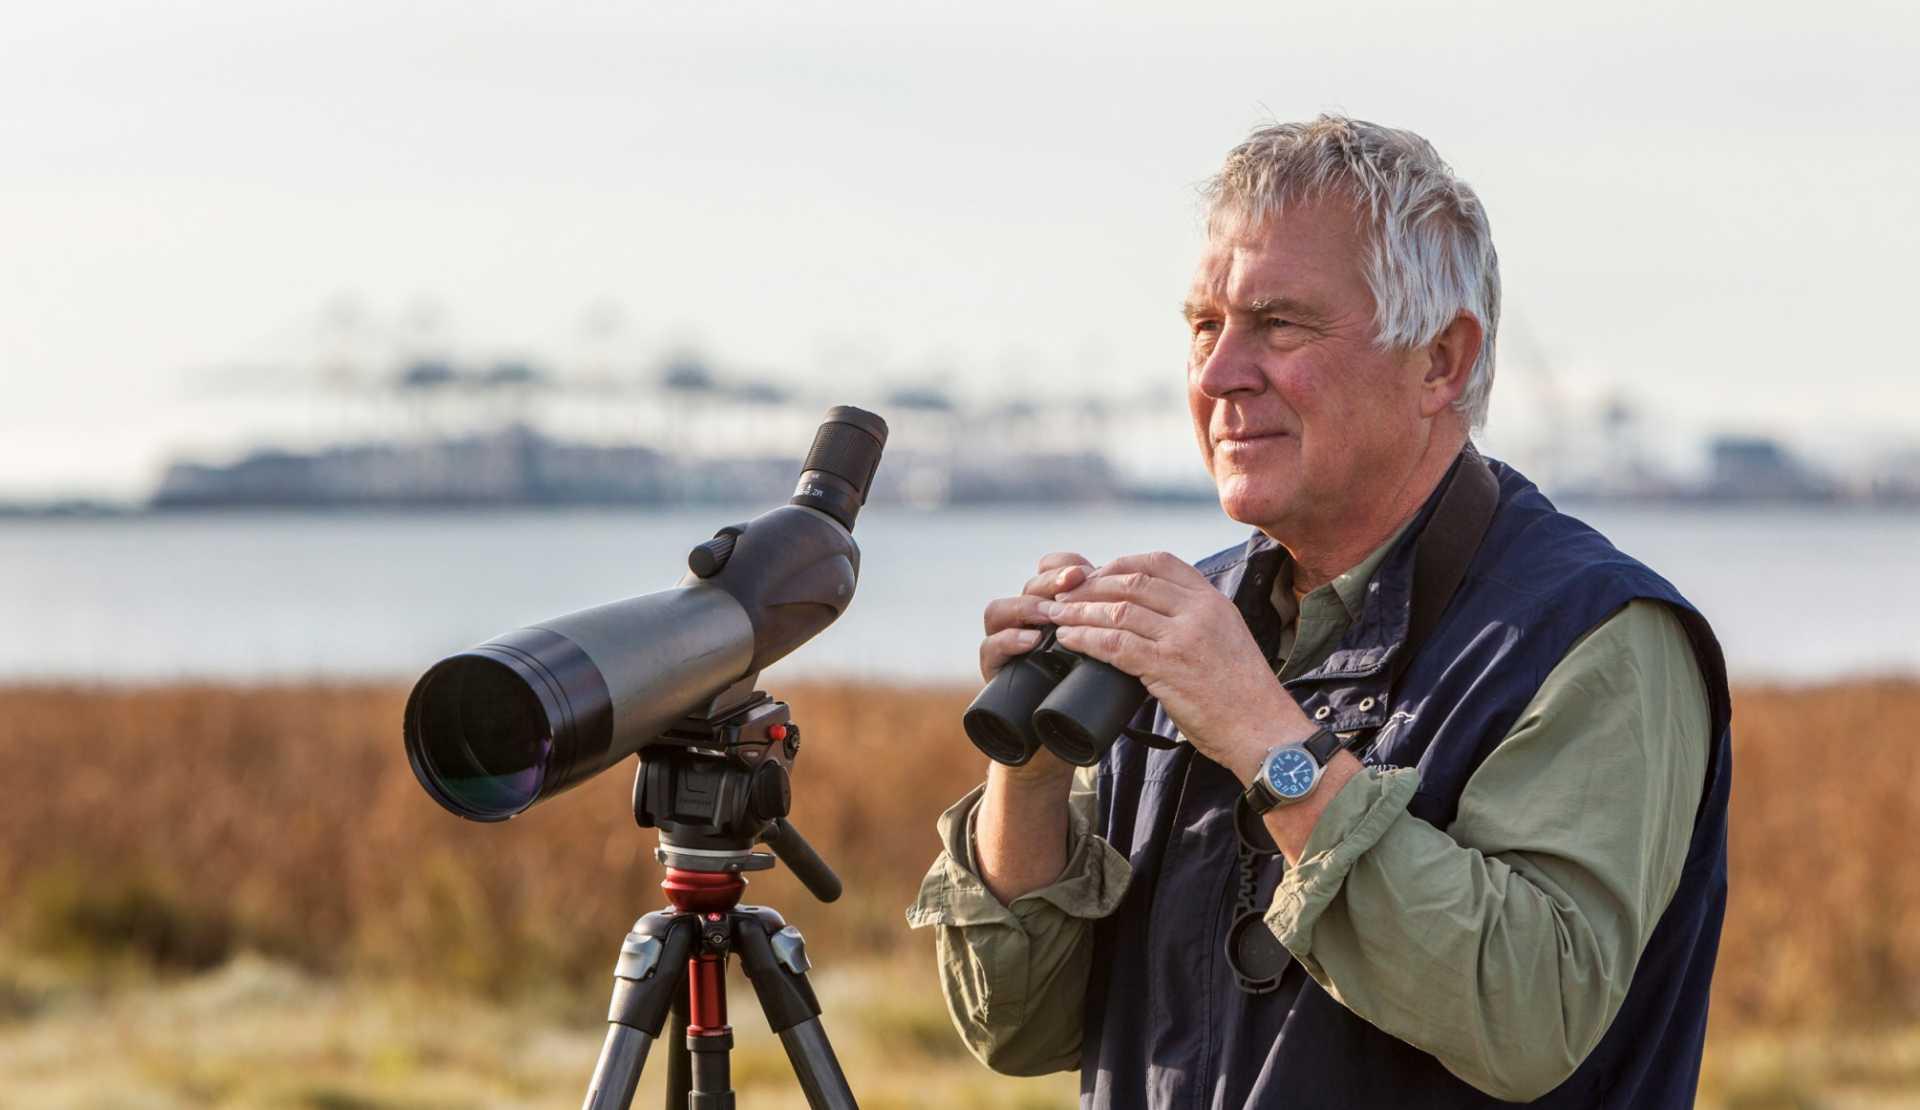 Dr. Robert Elner, adjunct professor at Simon Fraser University and emeritus scientist with Environment Canada.